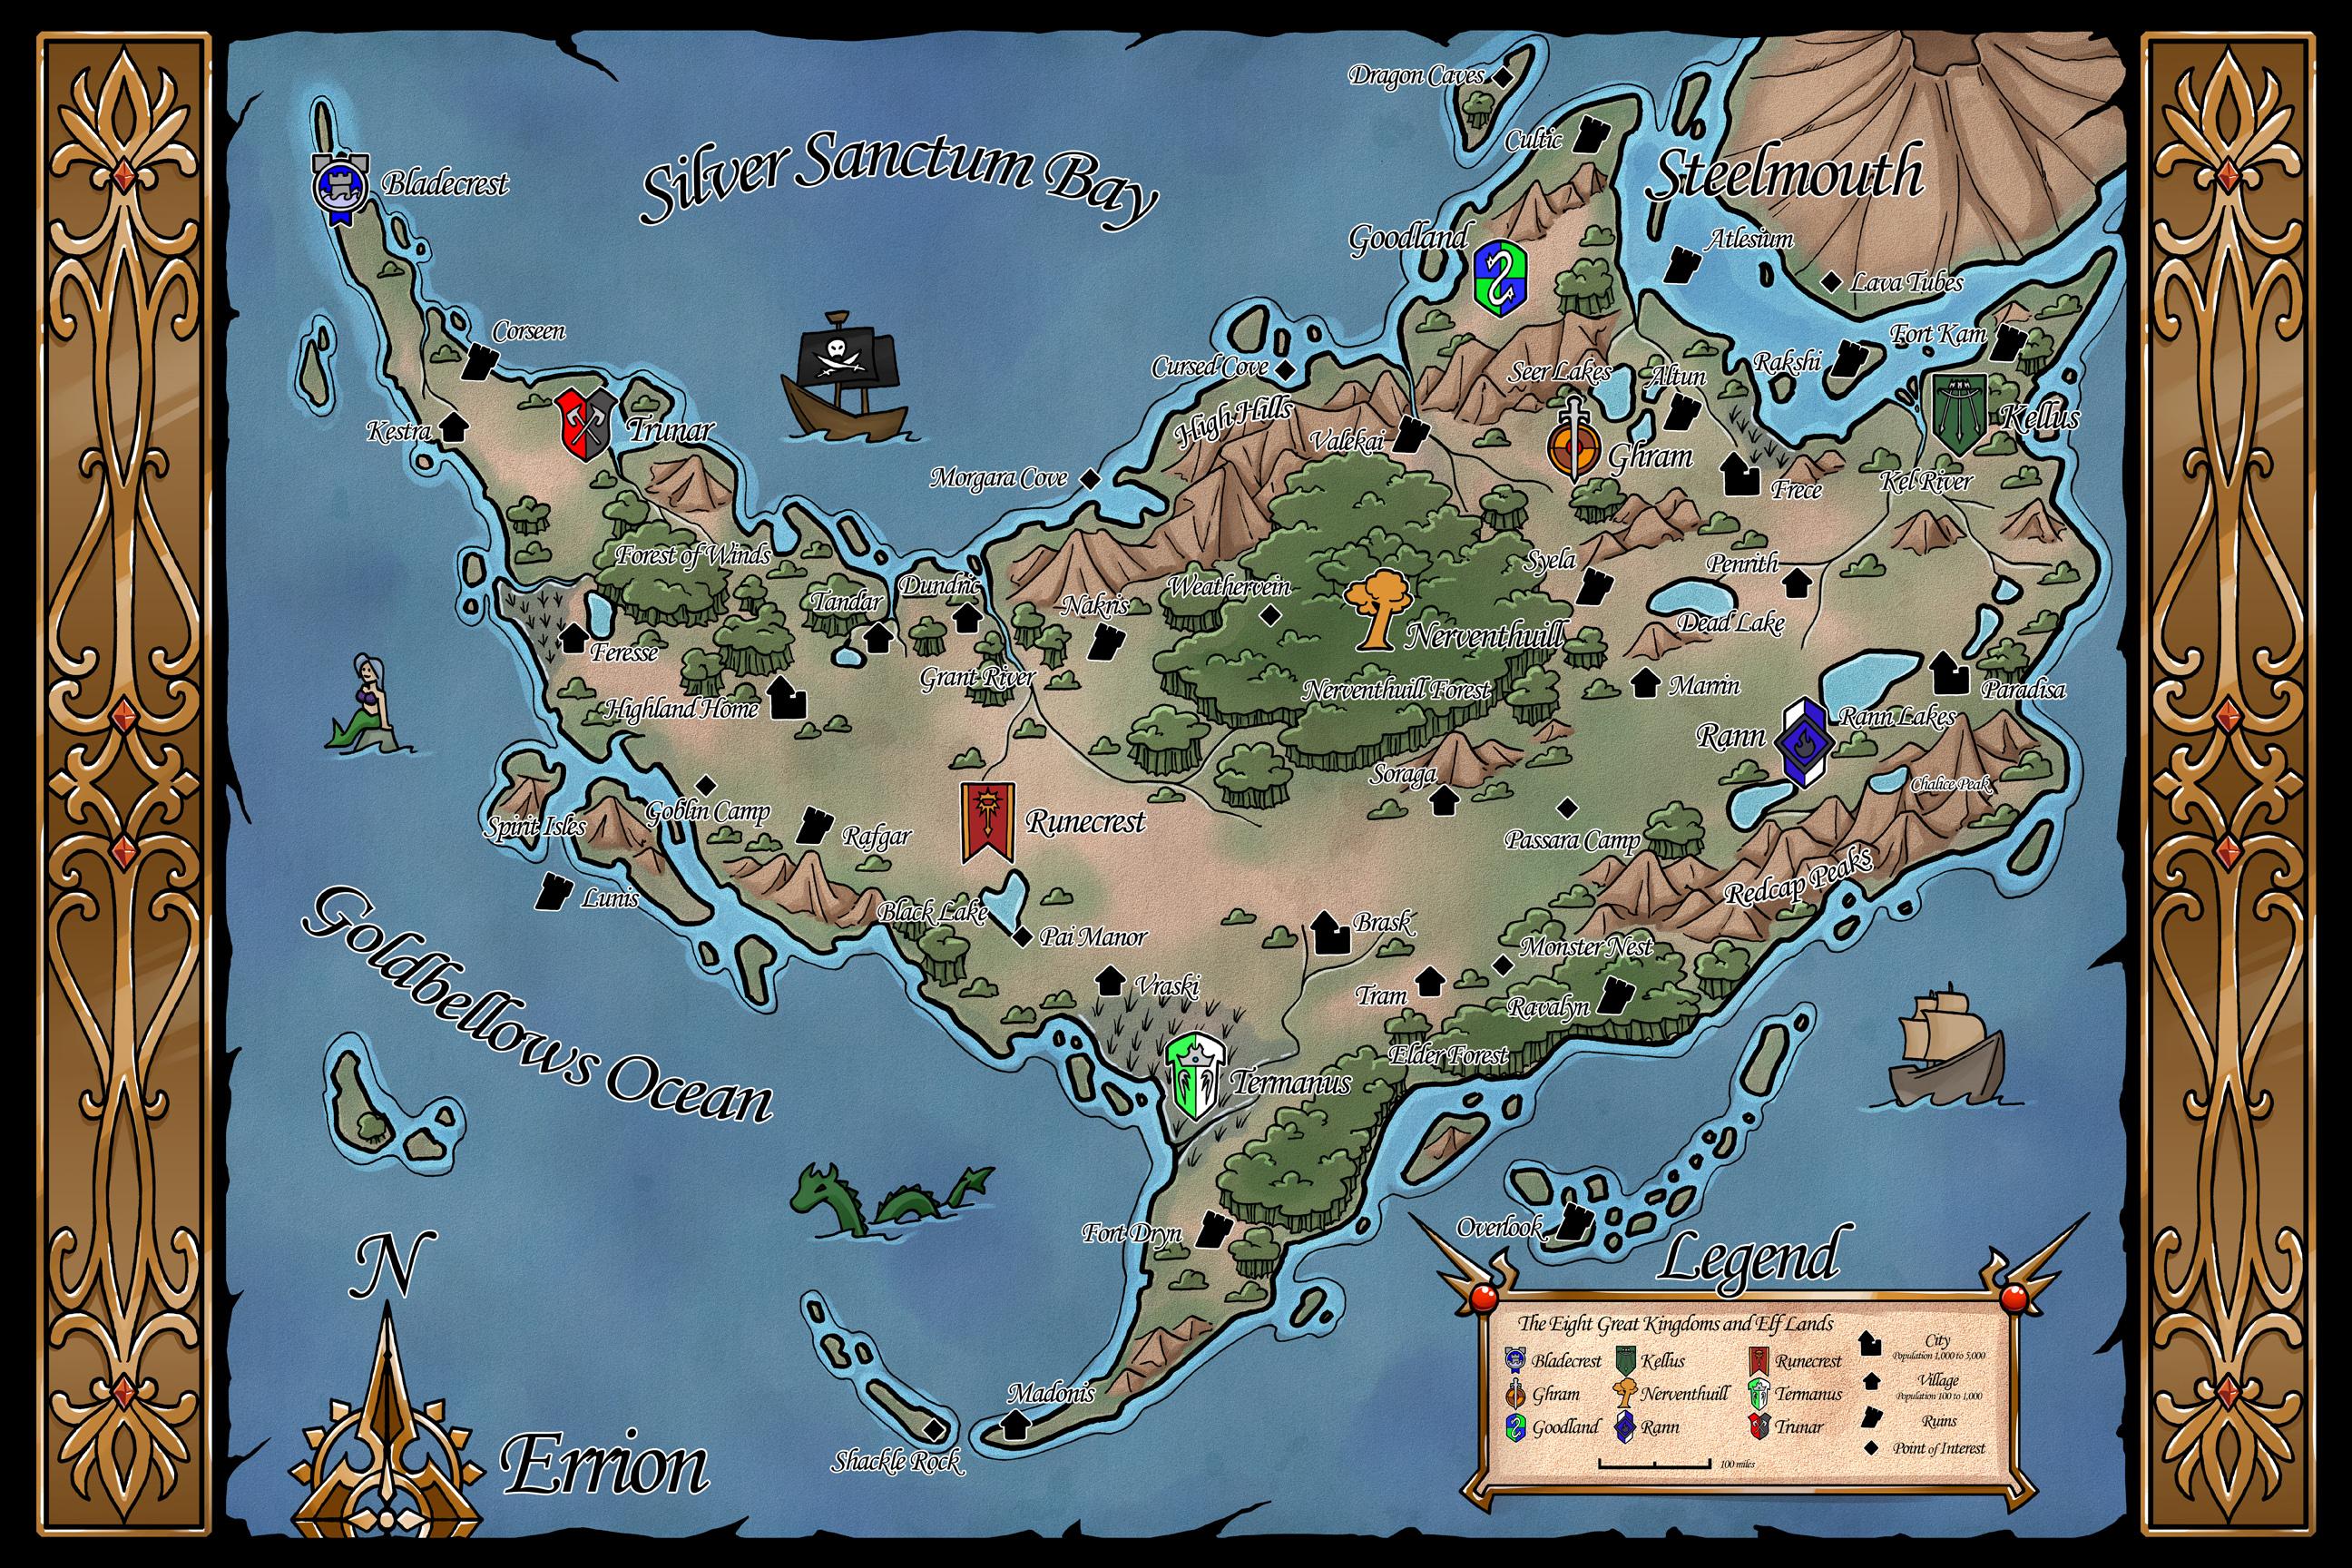 Errion Map